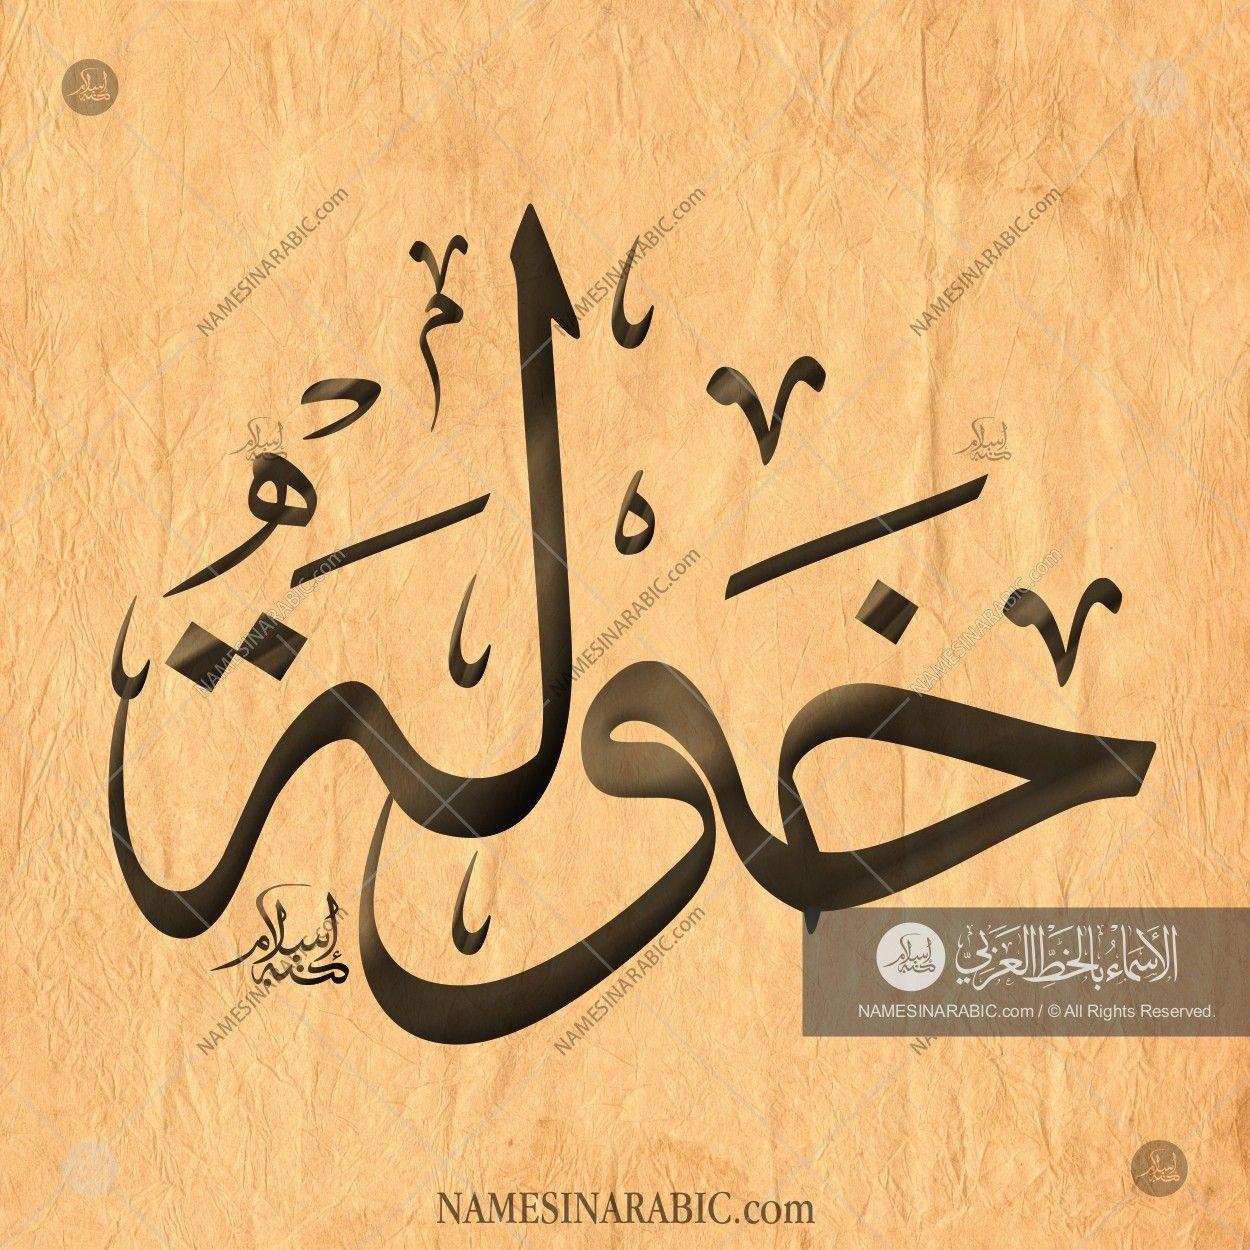 Khawlah خولة Names In Arabic Calligraphy Name 1885 Calligraphy Name Name Design Art Arabic Calligraphy Art